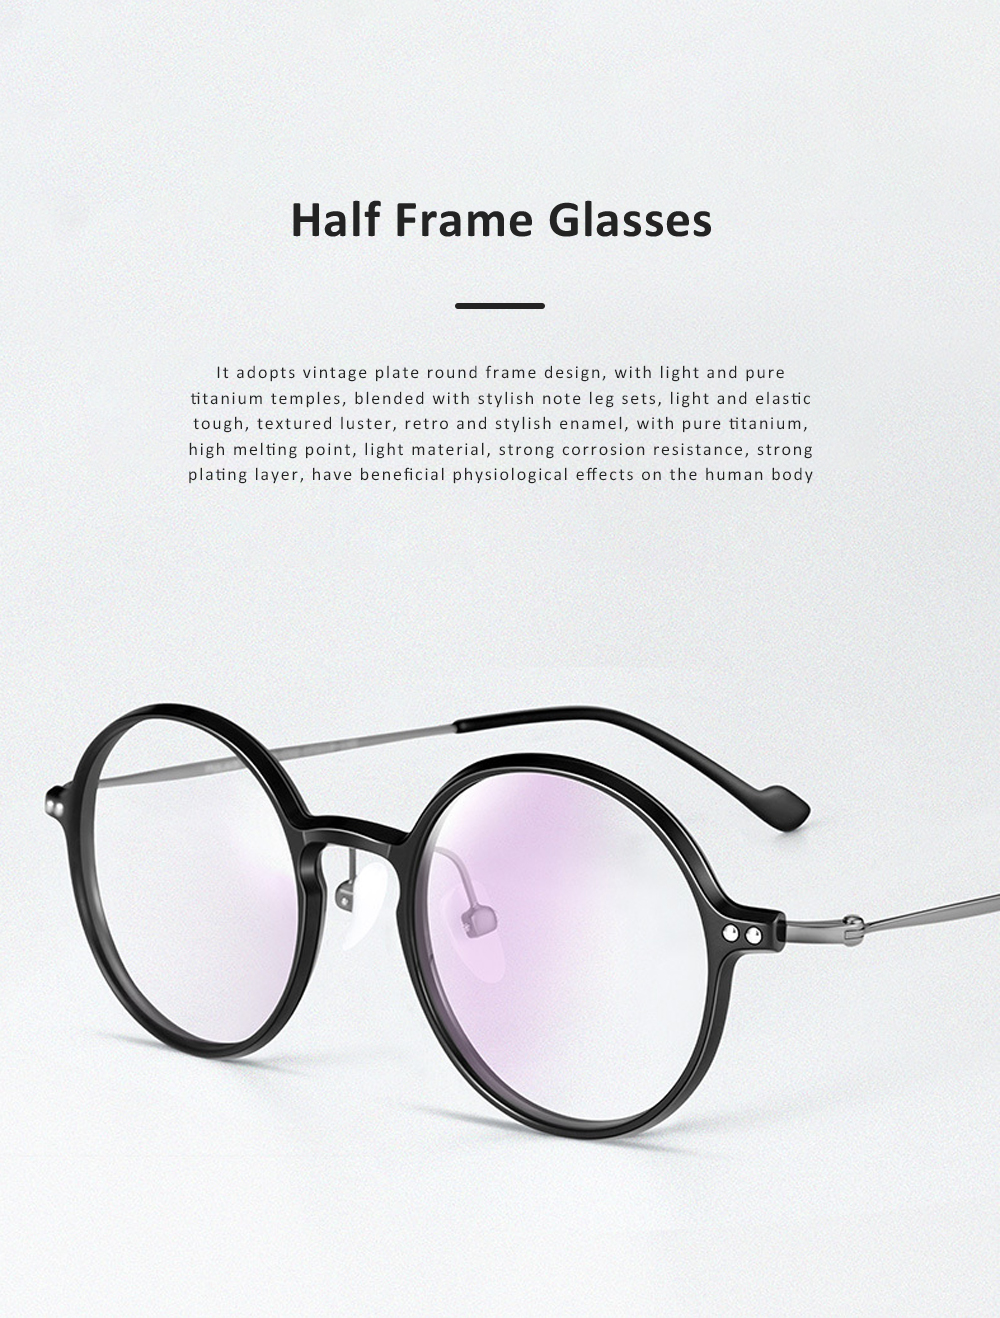 Thin Frame Flat Mirror Glasses Metal Fashion Eyeglass Round Frame Personality Trend Eye Glass Retro Glasses 0